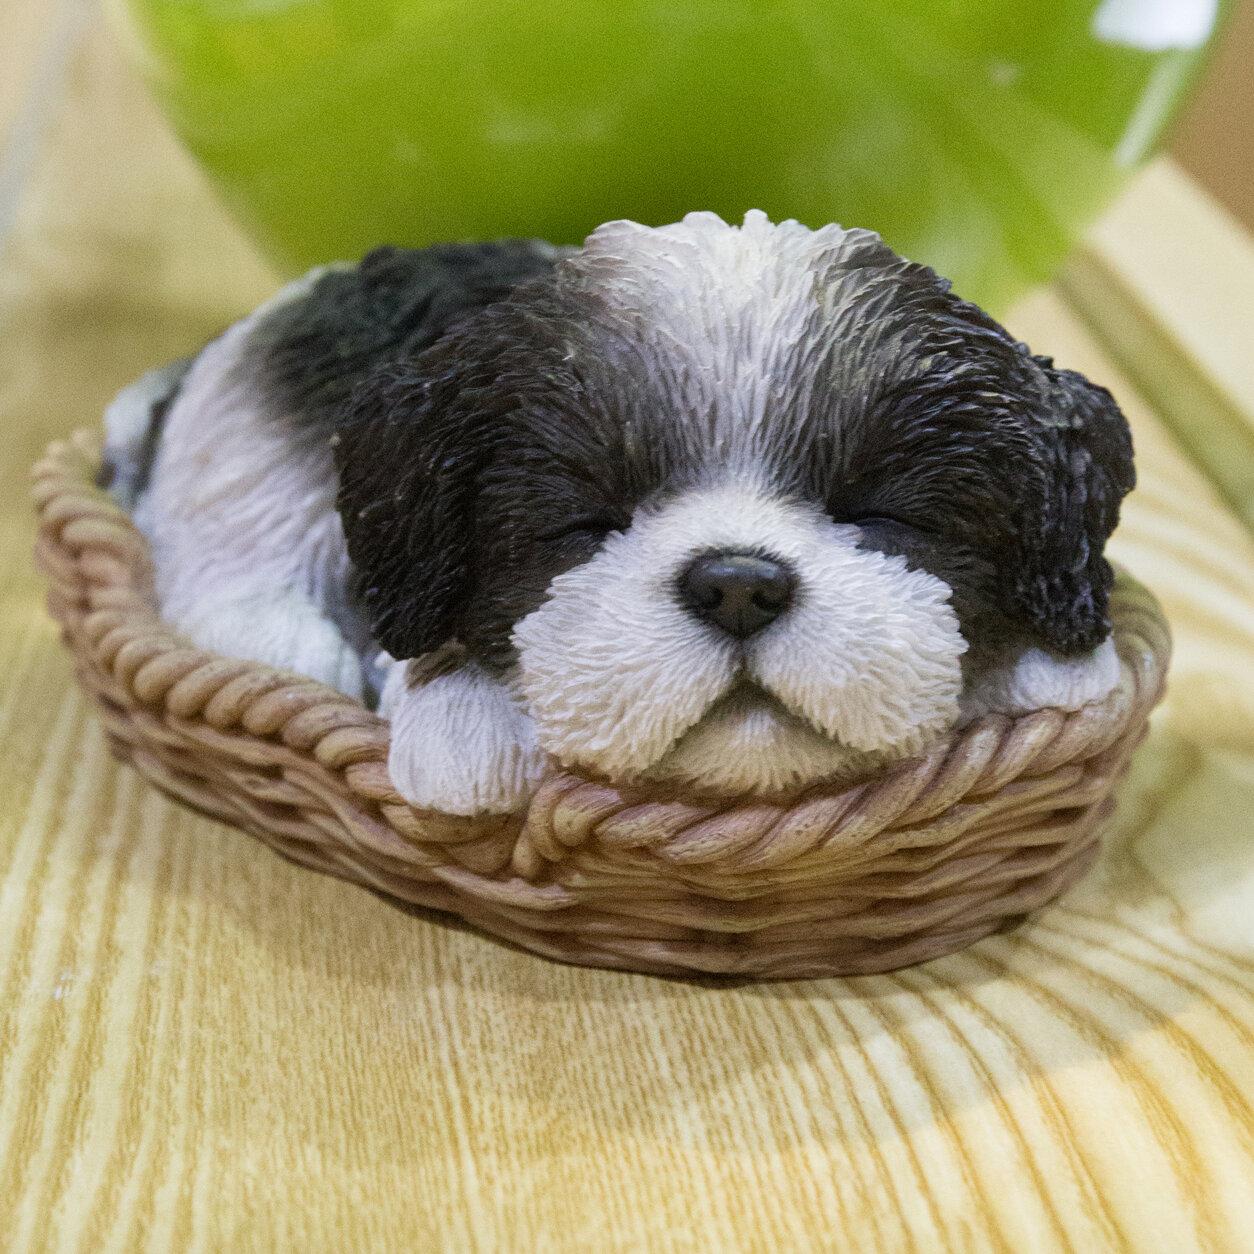 Hi Line Gift Ltd Wicker Basket Shih Tzu Puppy Statue Reviews